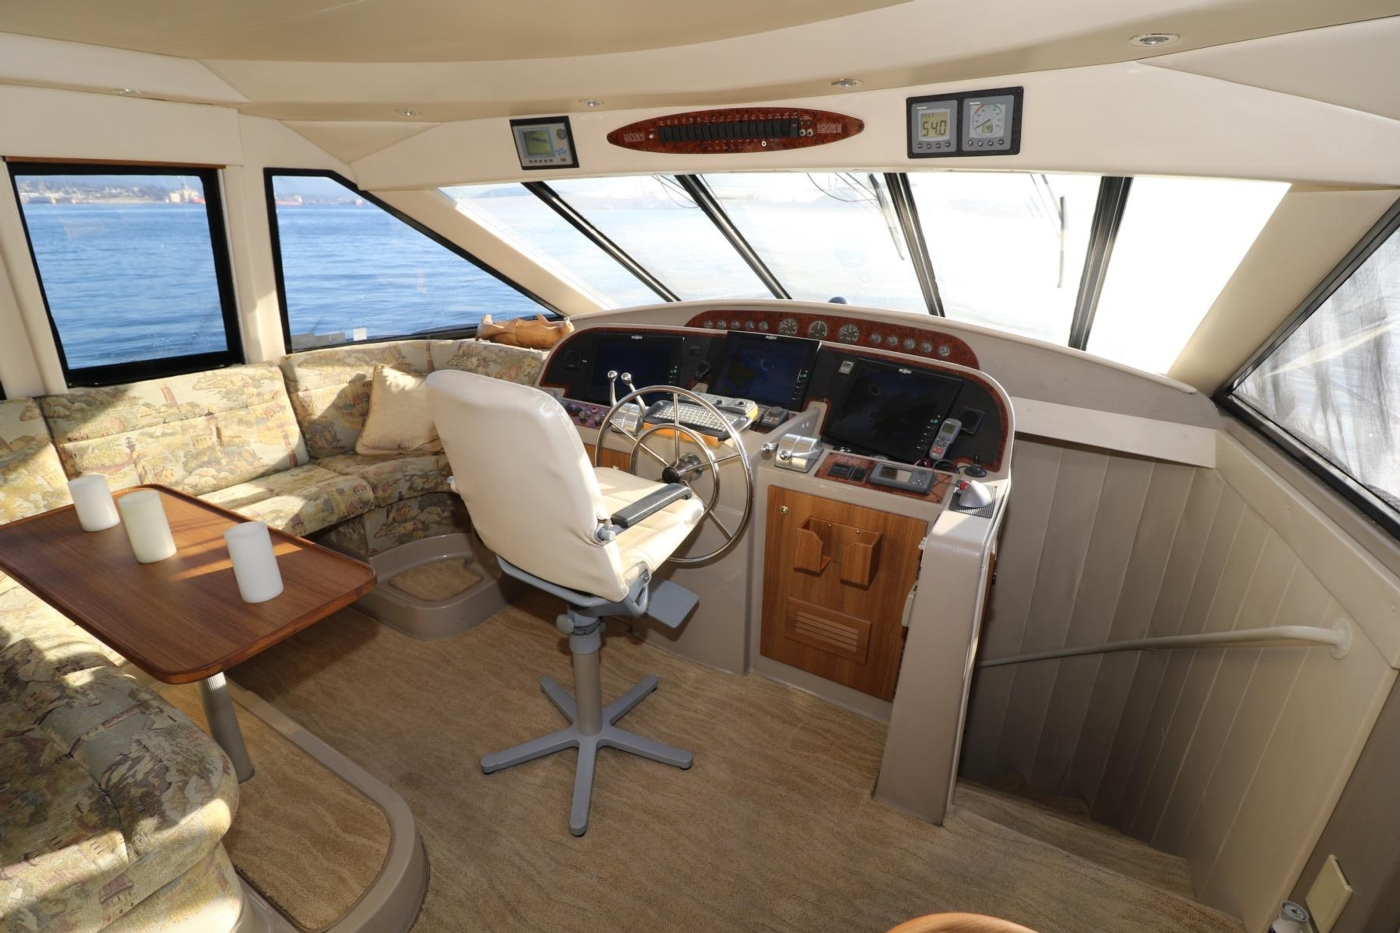 1999 Bayliner 5788 Pilot House Motoryacht, Pilothouse Looking Forward